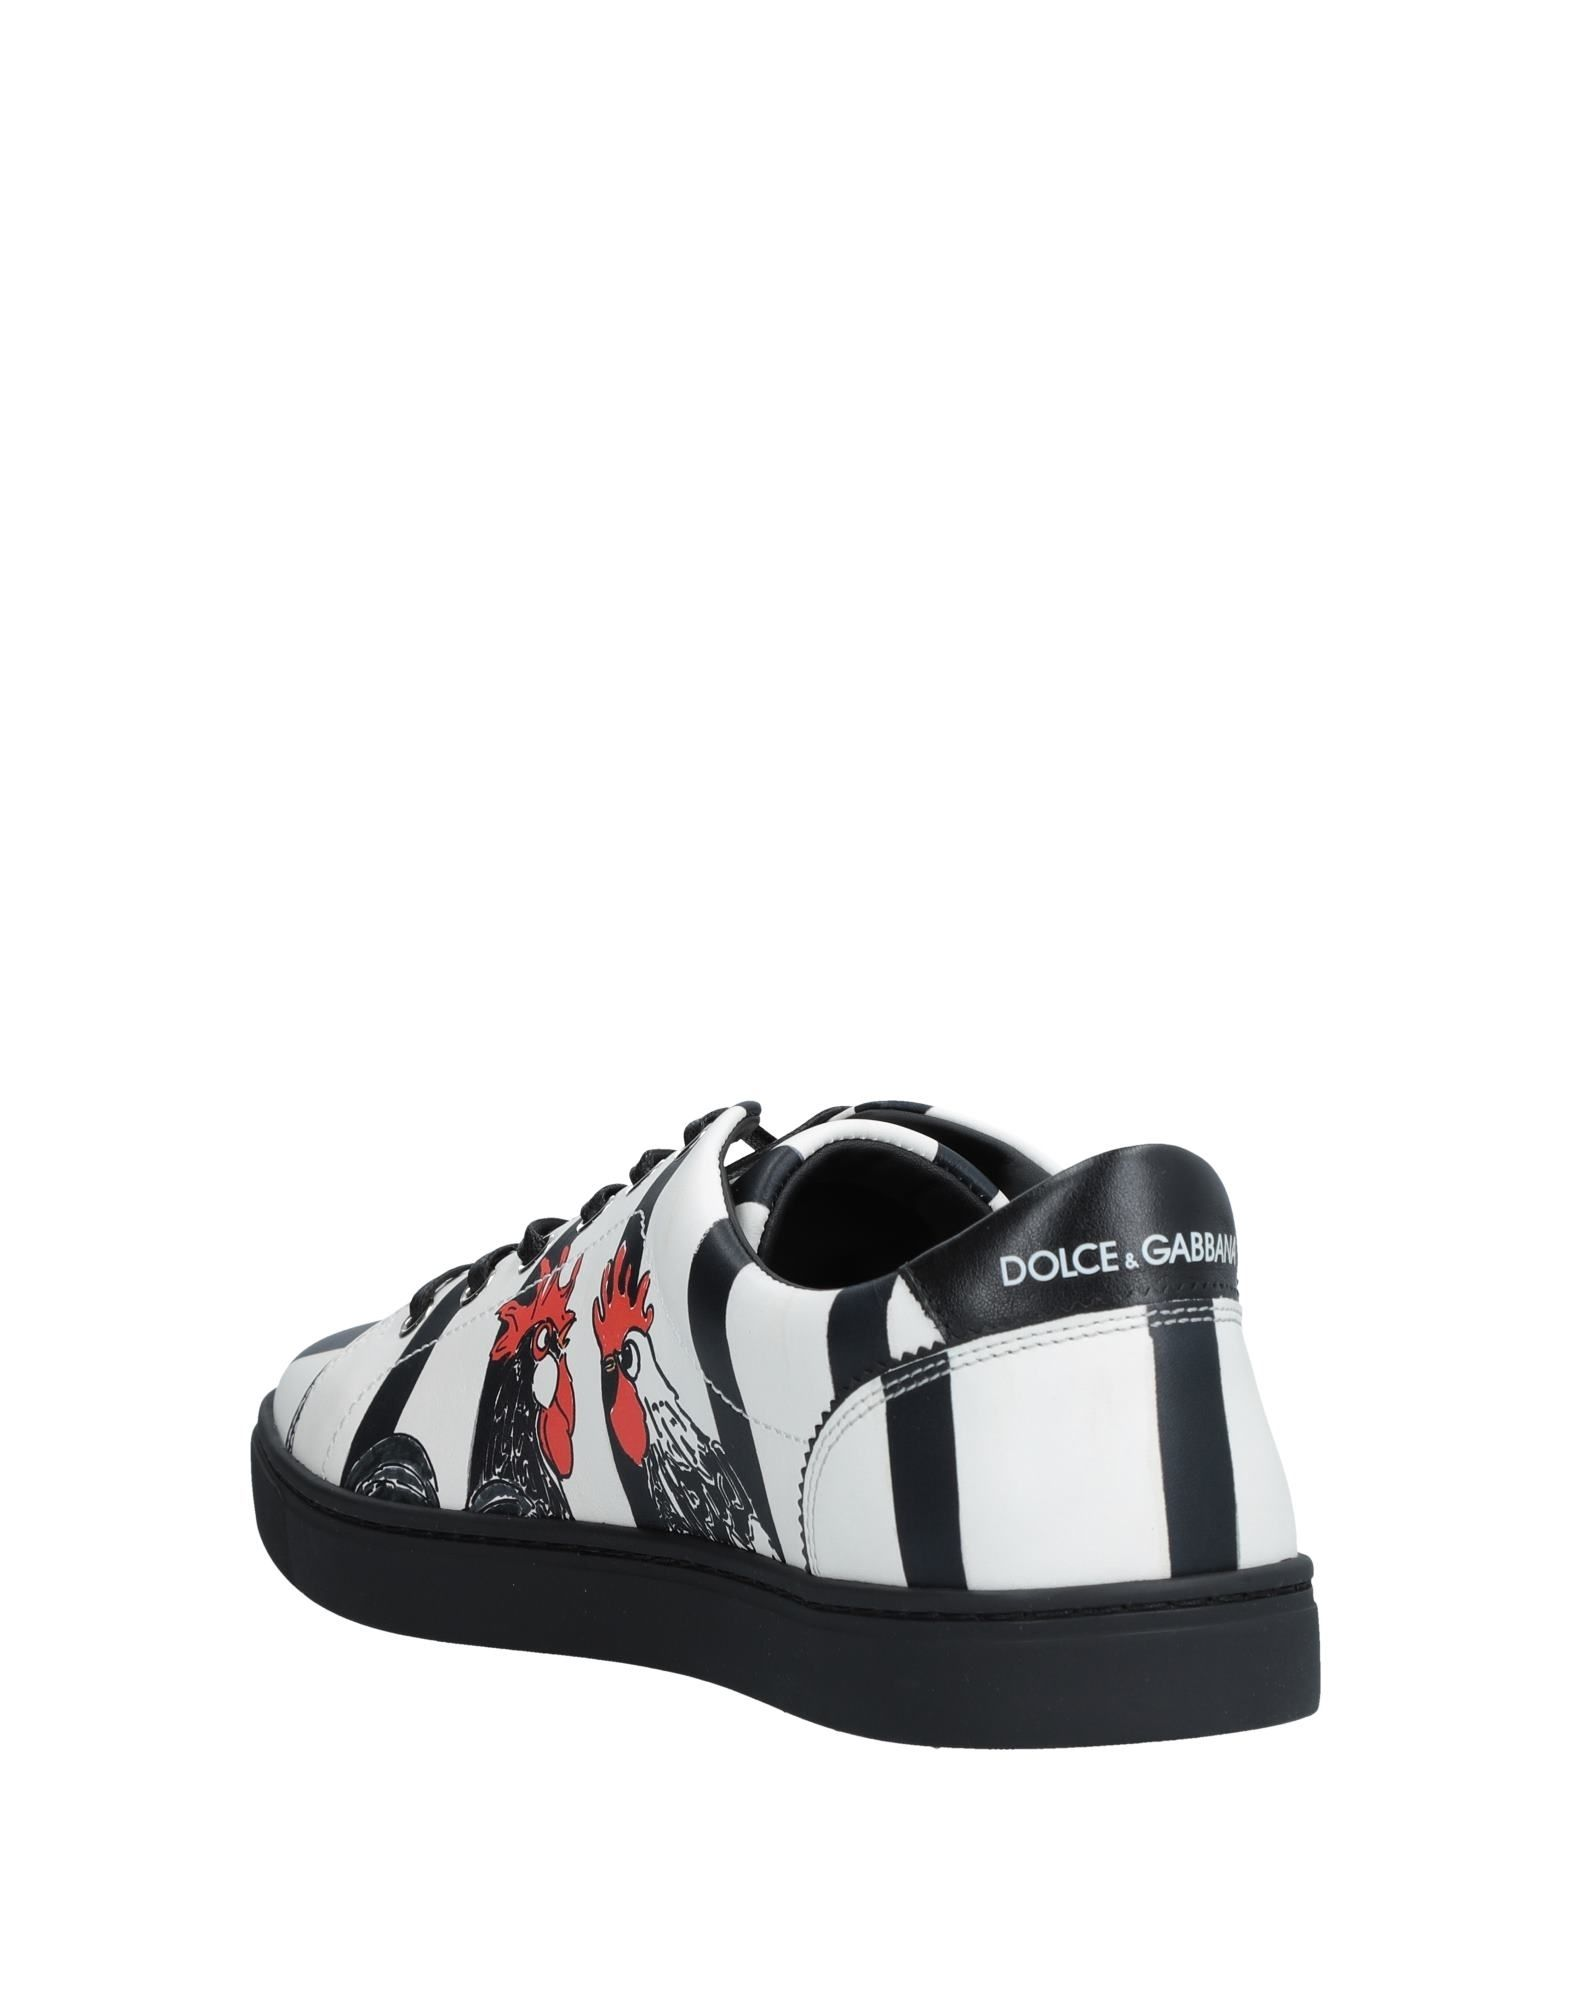 Dolce & Gabbana Sneakers beliebte Herren  11542648VR Gute Qualität beliebte Sneakers Schuhe 693804